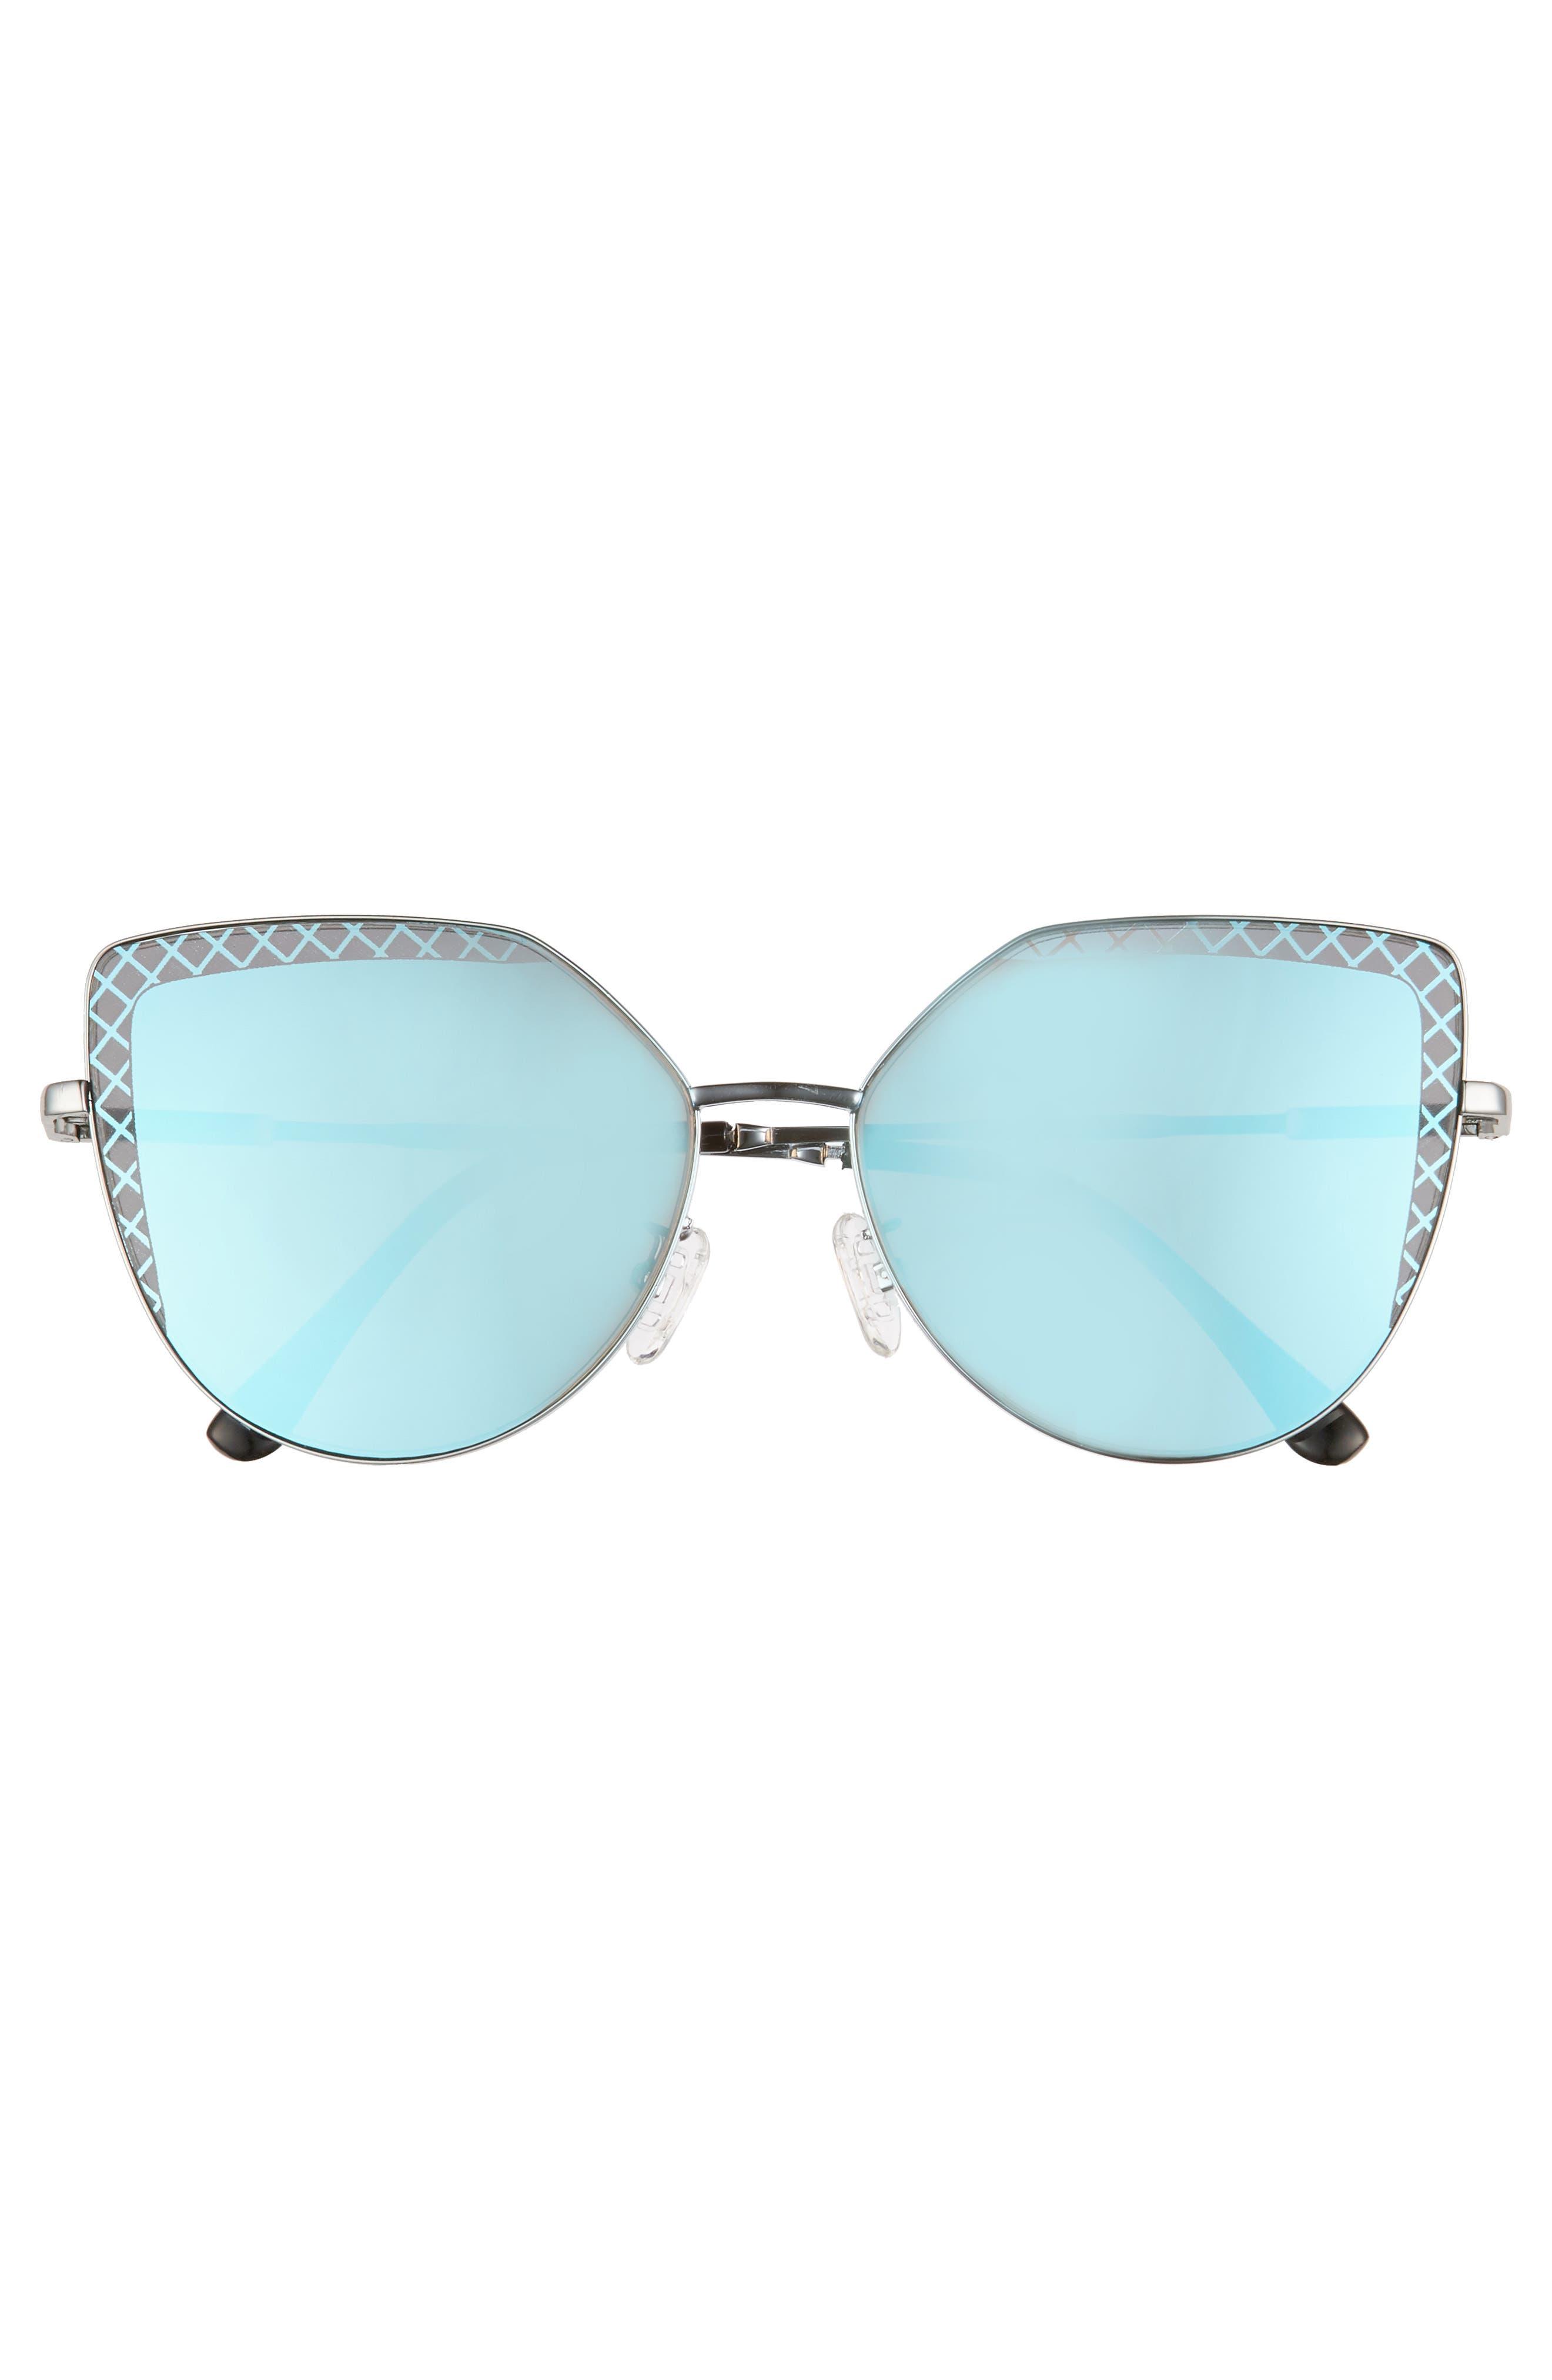 60mm Textured Lens Cat Eye Sunglasses,                             Alternate thumbnail 3, color,                             SILVER/ BLUE